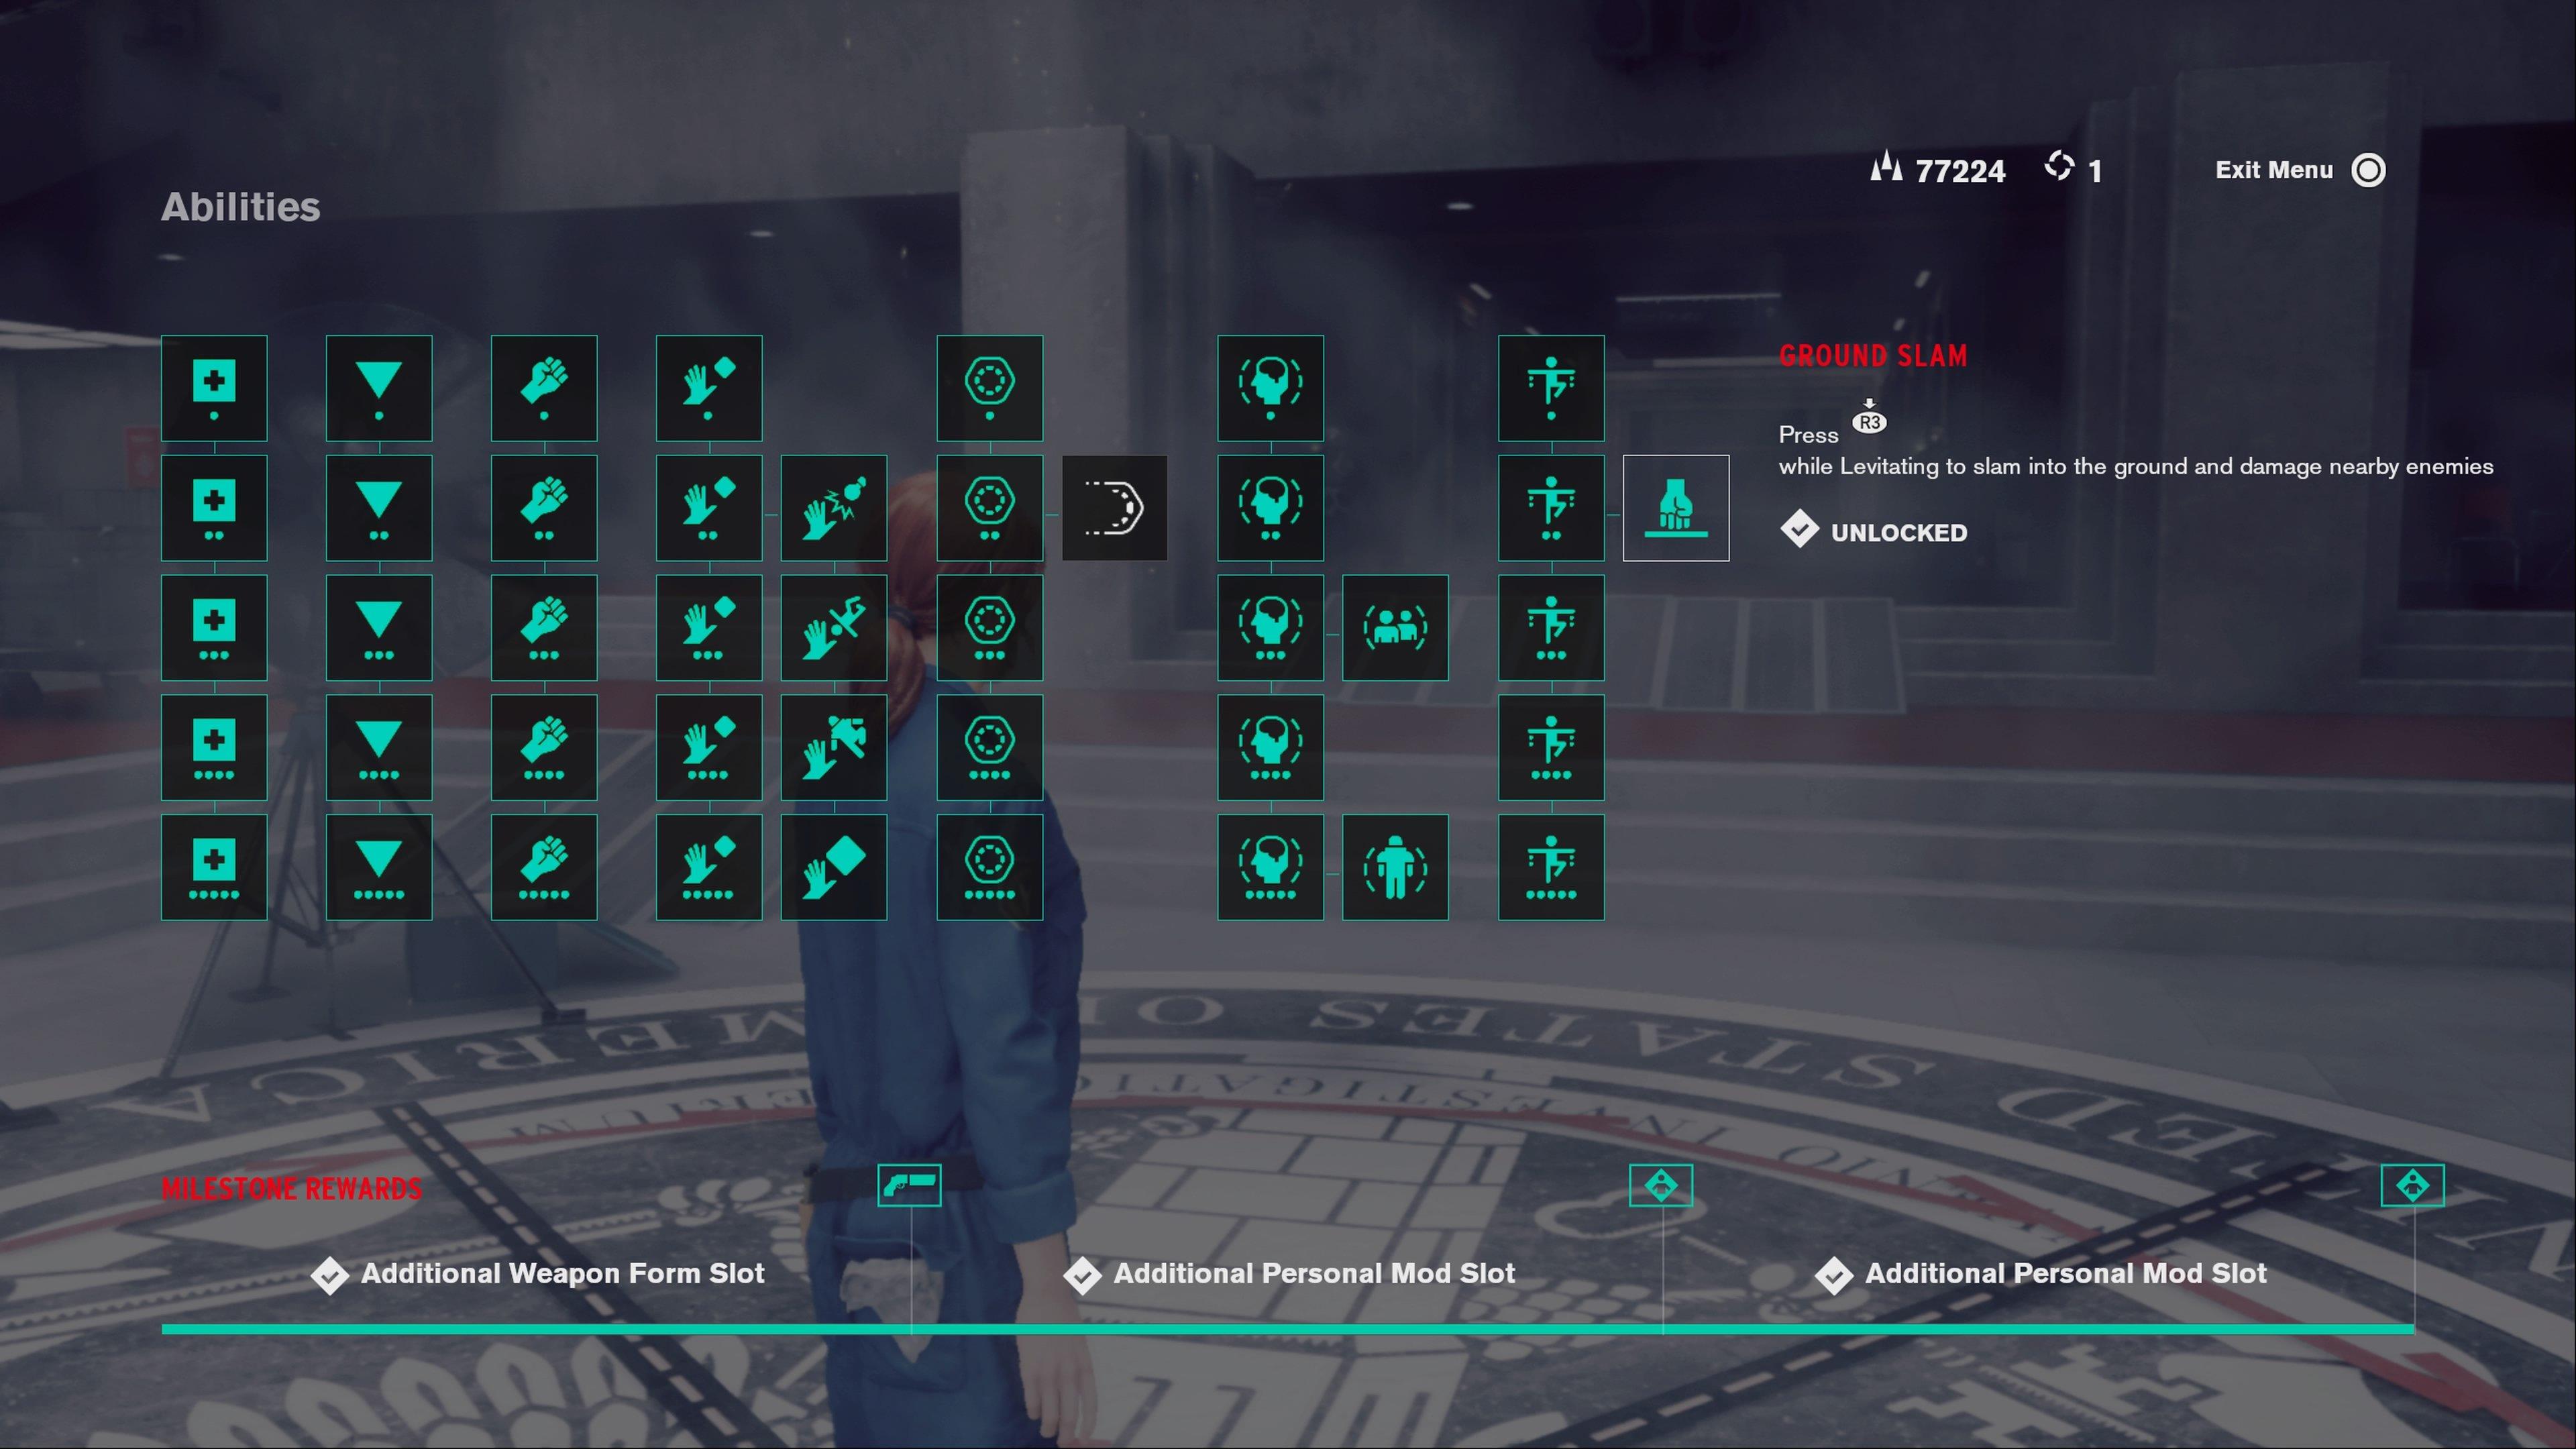 Full Ability Tree in Control | AllGamers